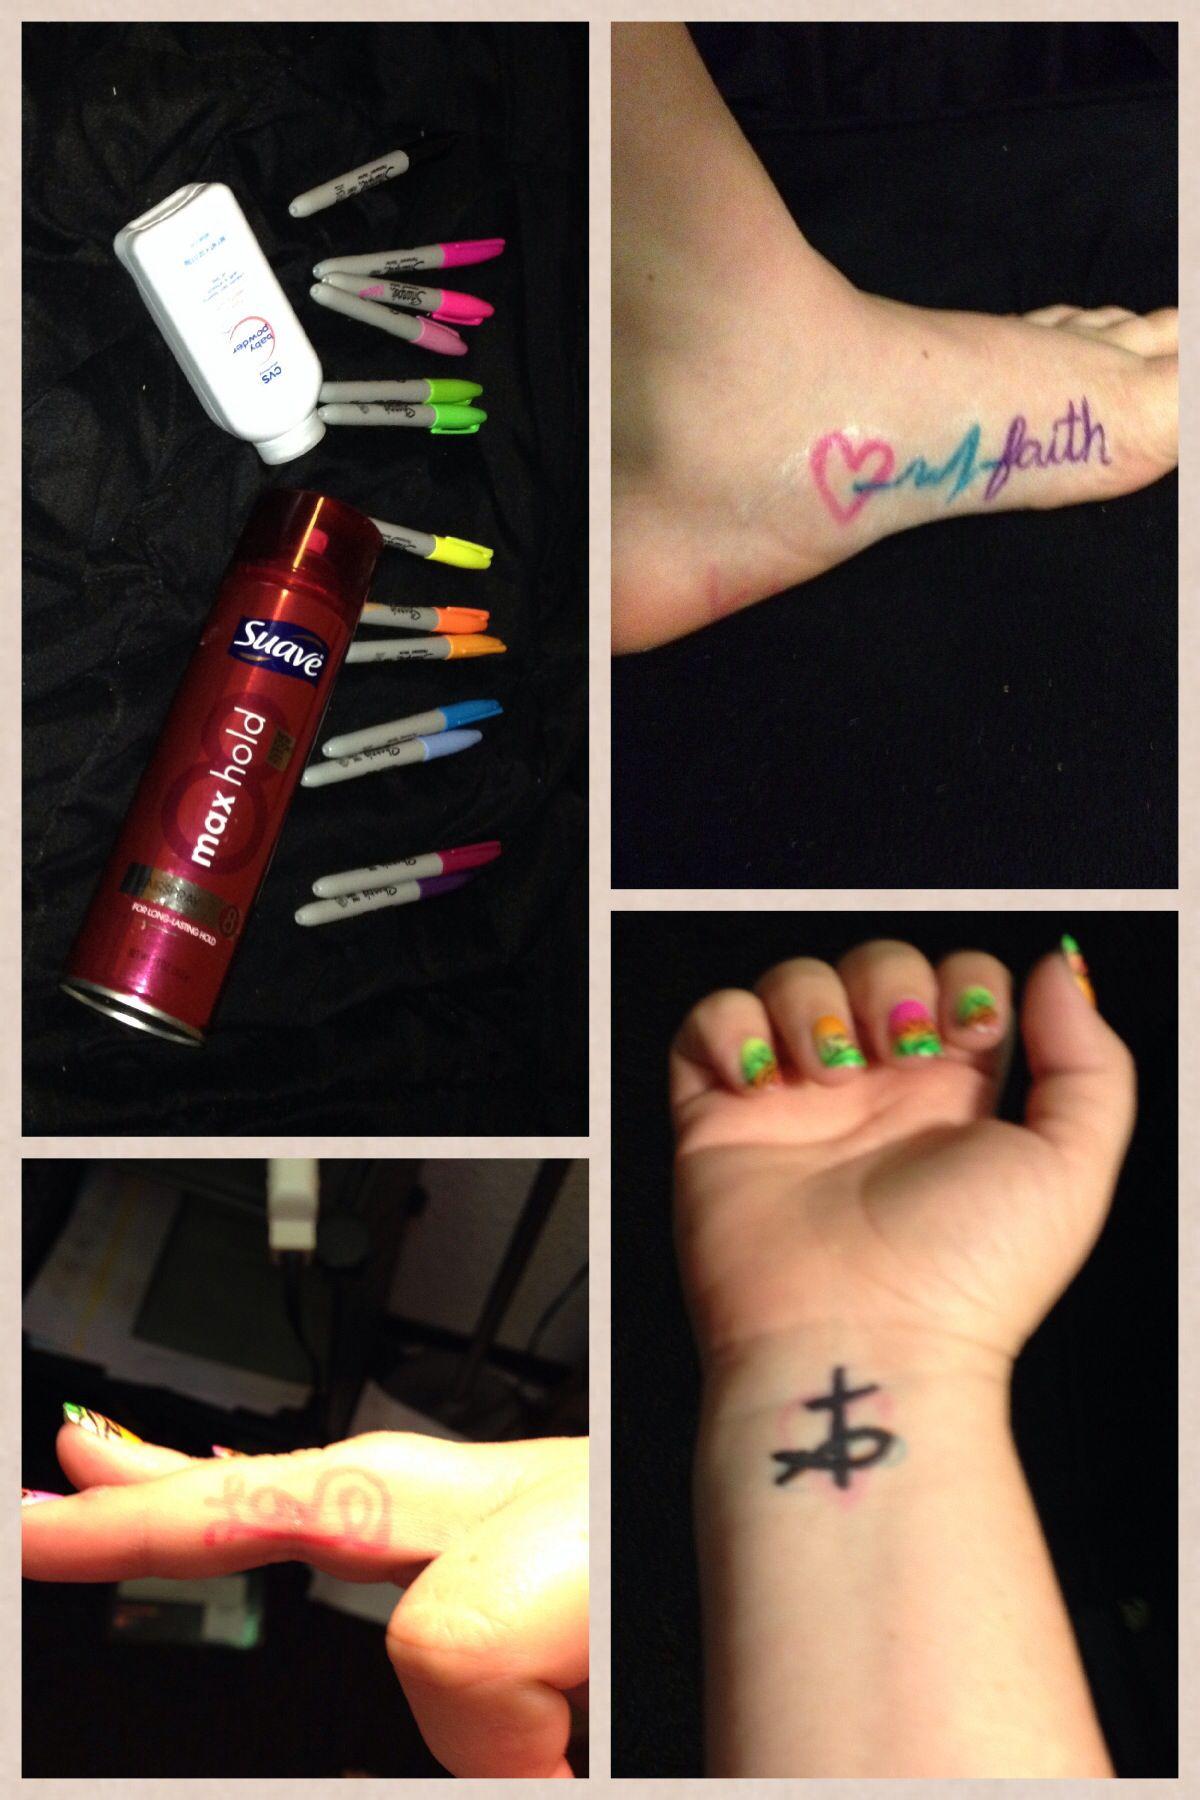 How to Make a Fake Tattoo With a Sharpie | eHow